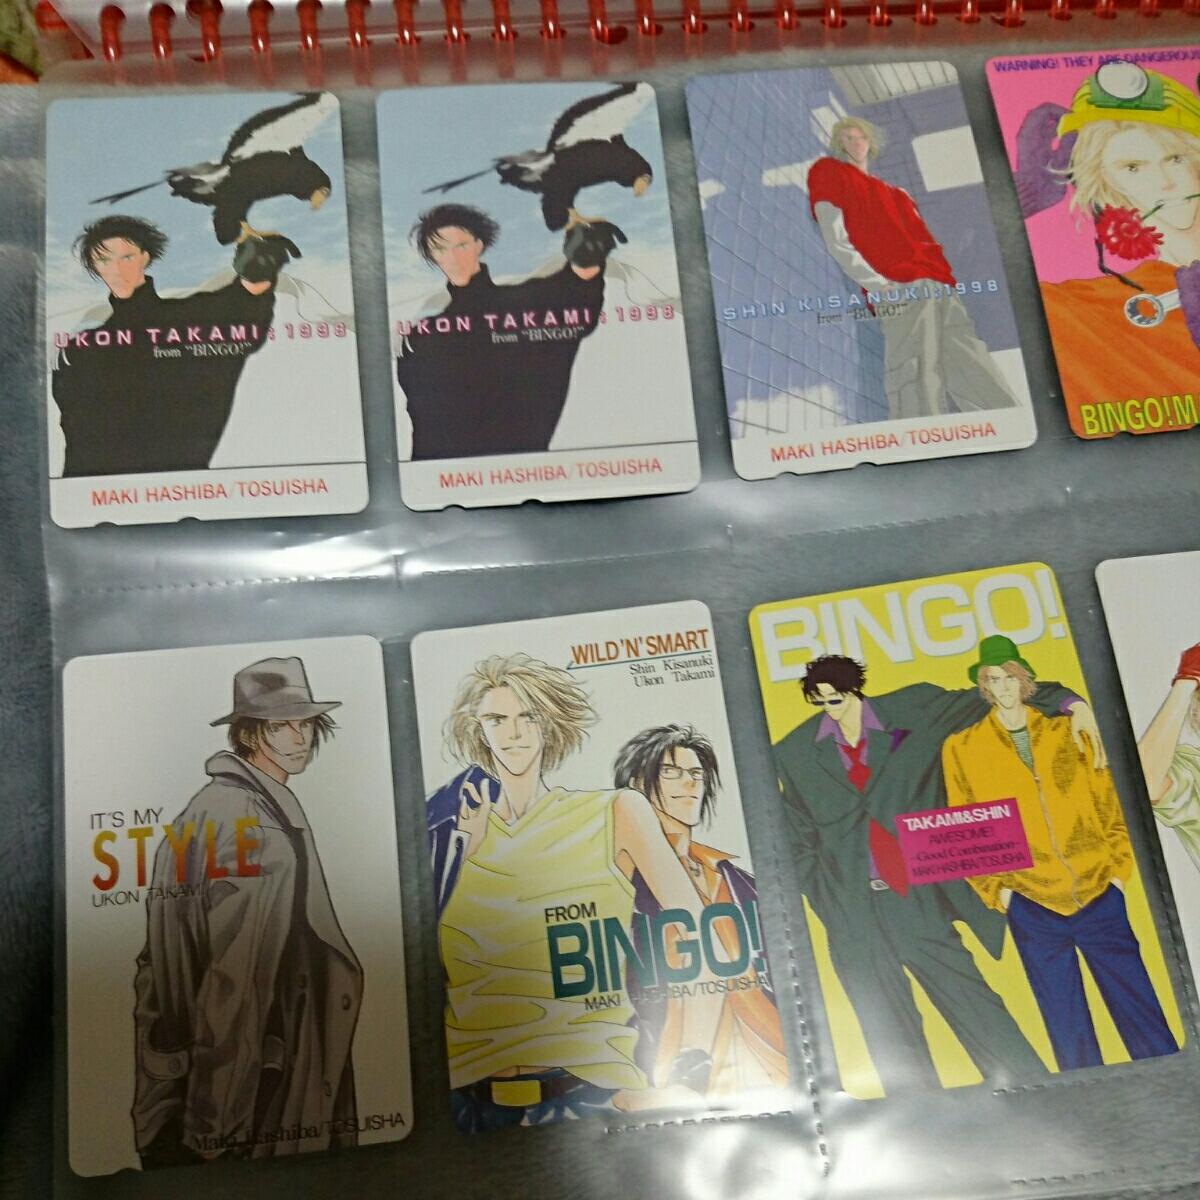 BINGO!等 Maki Hasiba先生 作品テレホンカード50度×14枚セット 冬水社_画像2